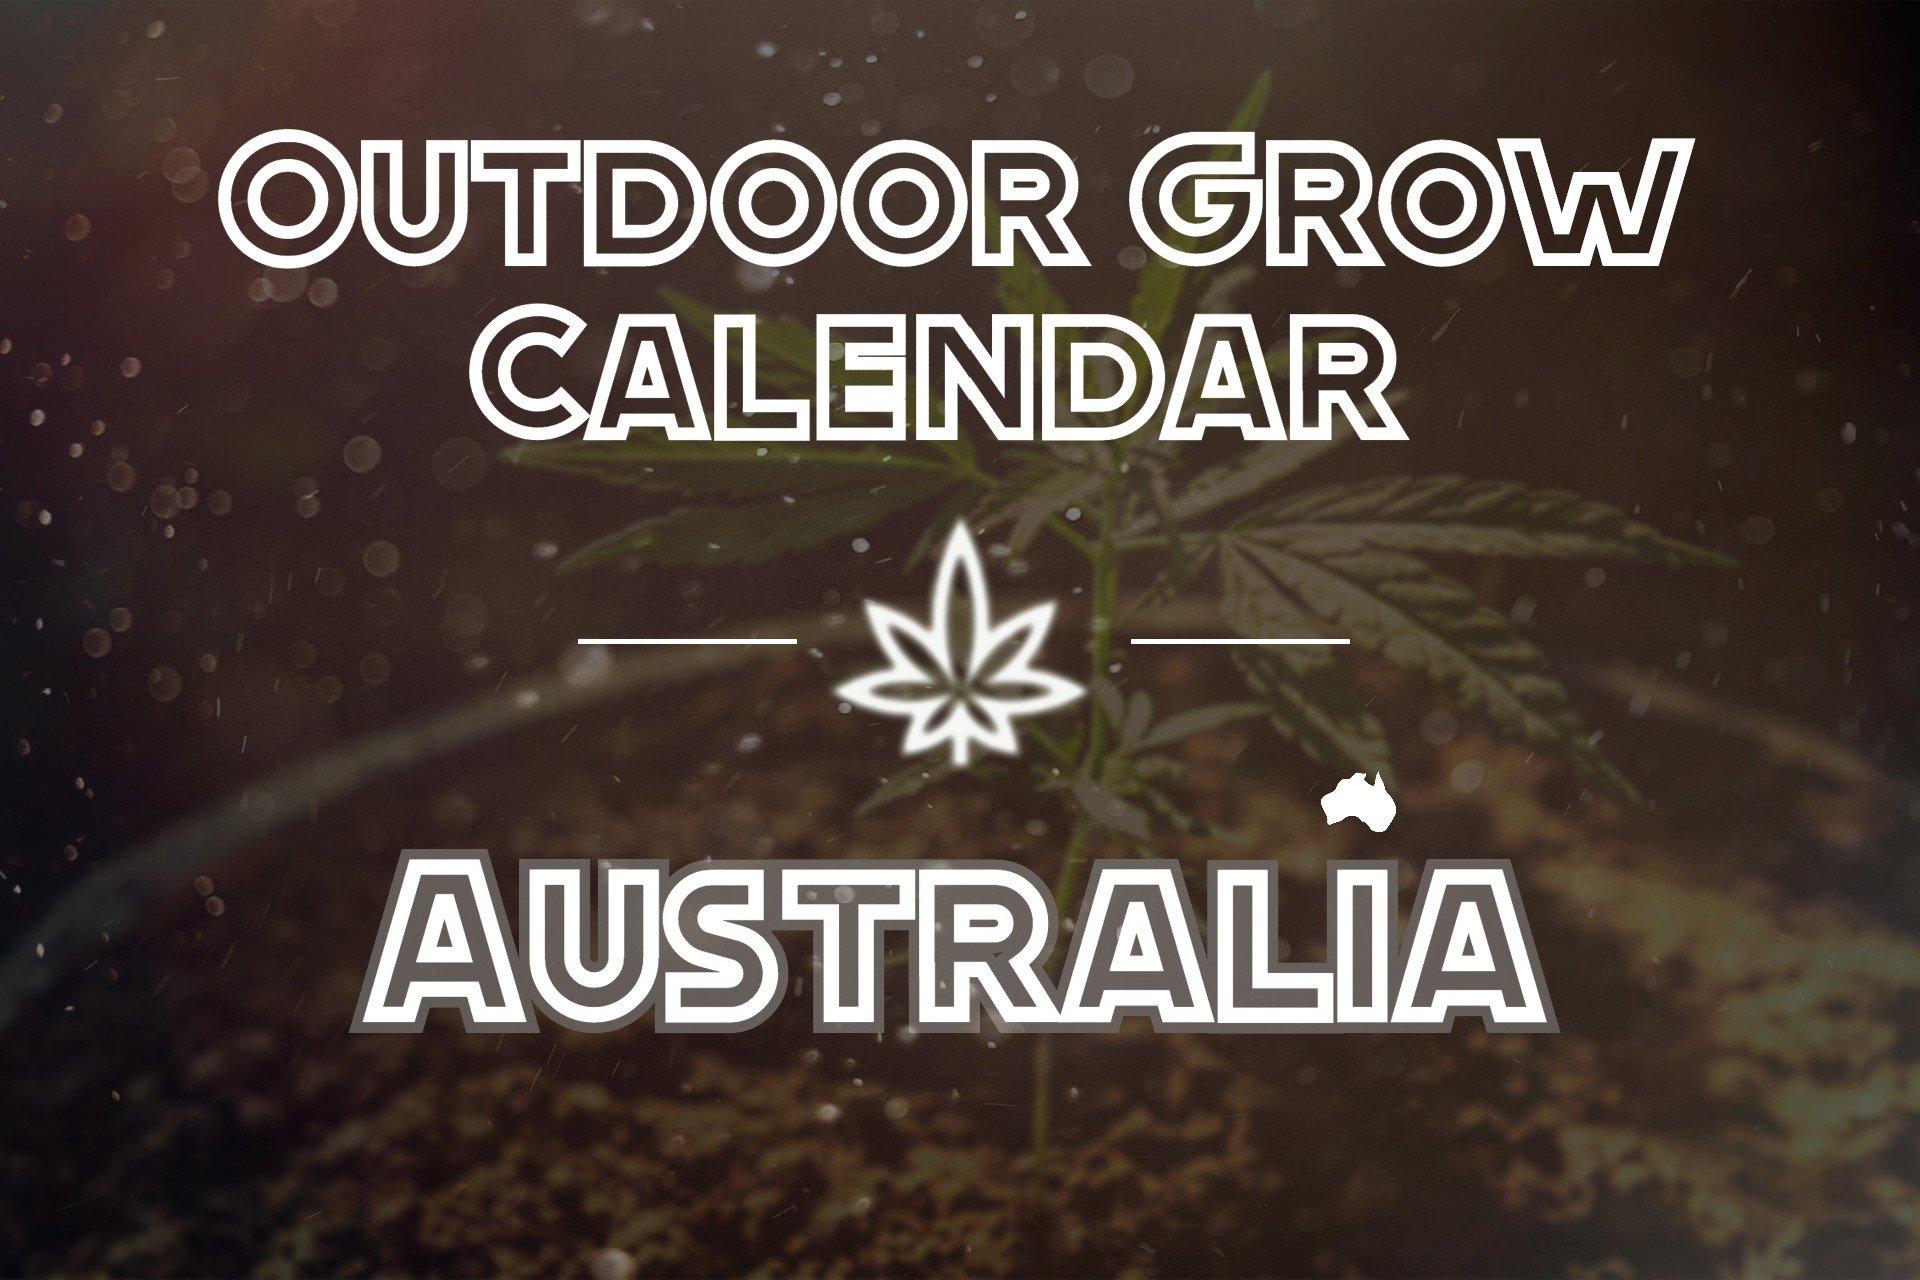 Outdoor Grow Calendar Australia